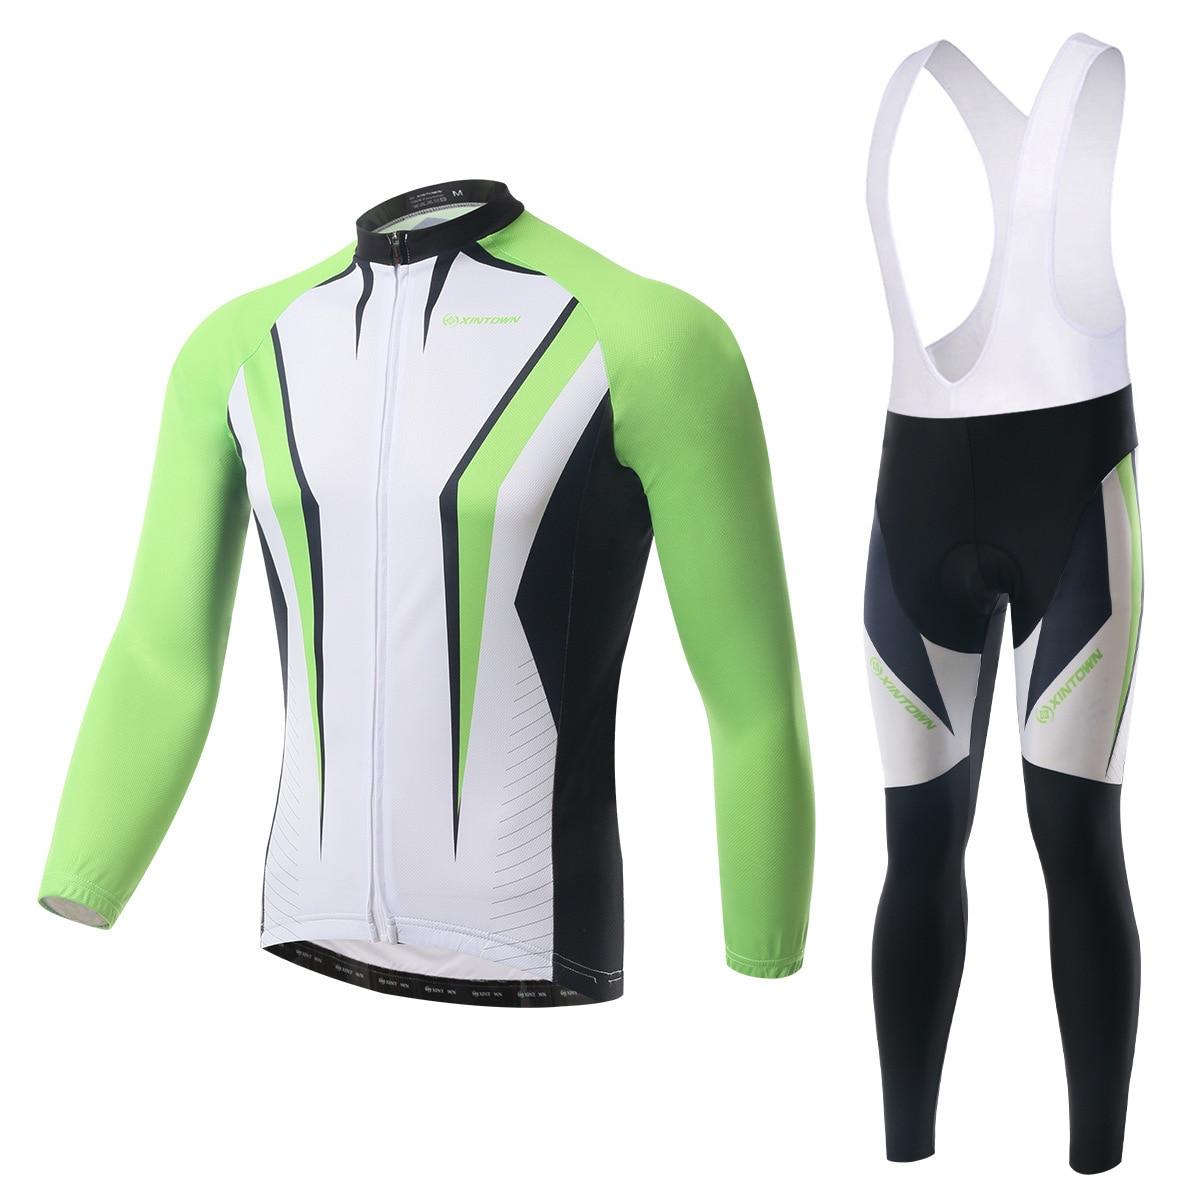 XINTOWN 2018 Men Spring Bib Sets Anti-Wrinkle Long Sleeve Cycling Jersey Ropa Ciclismo Quick Dry Cycling Jersey Bib Sets